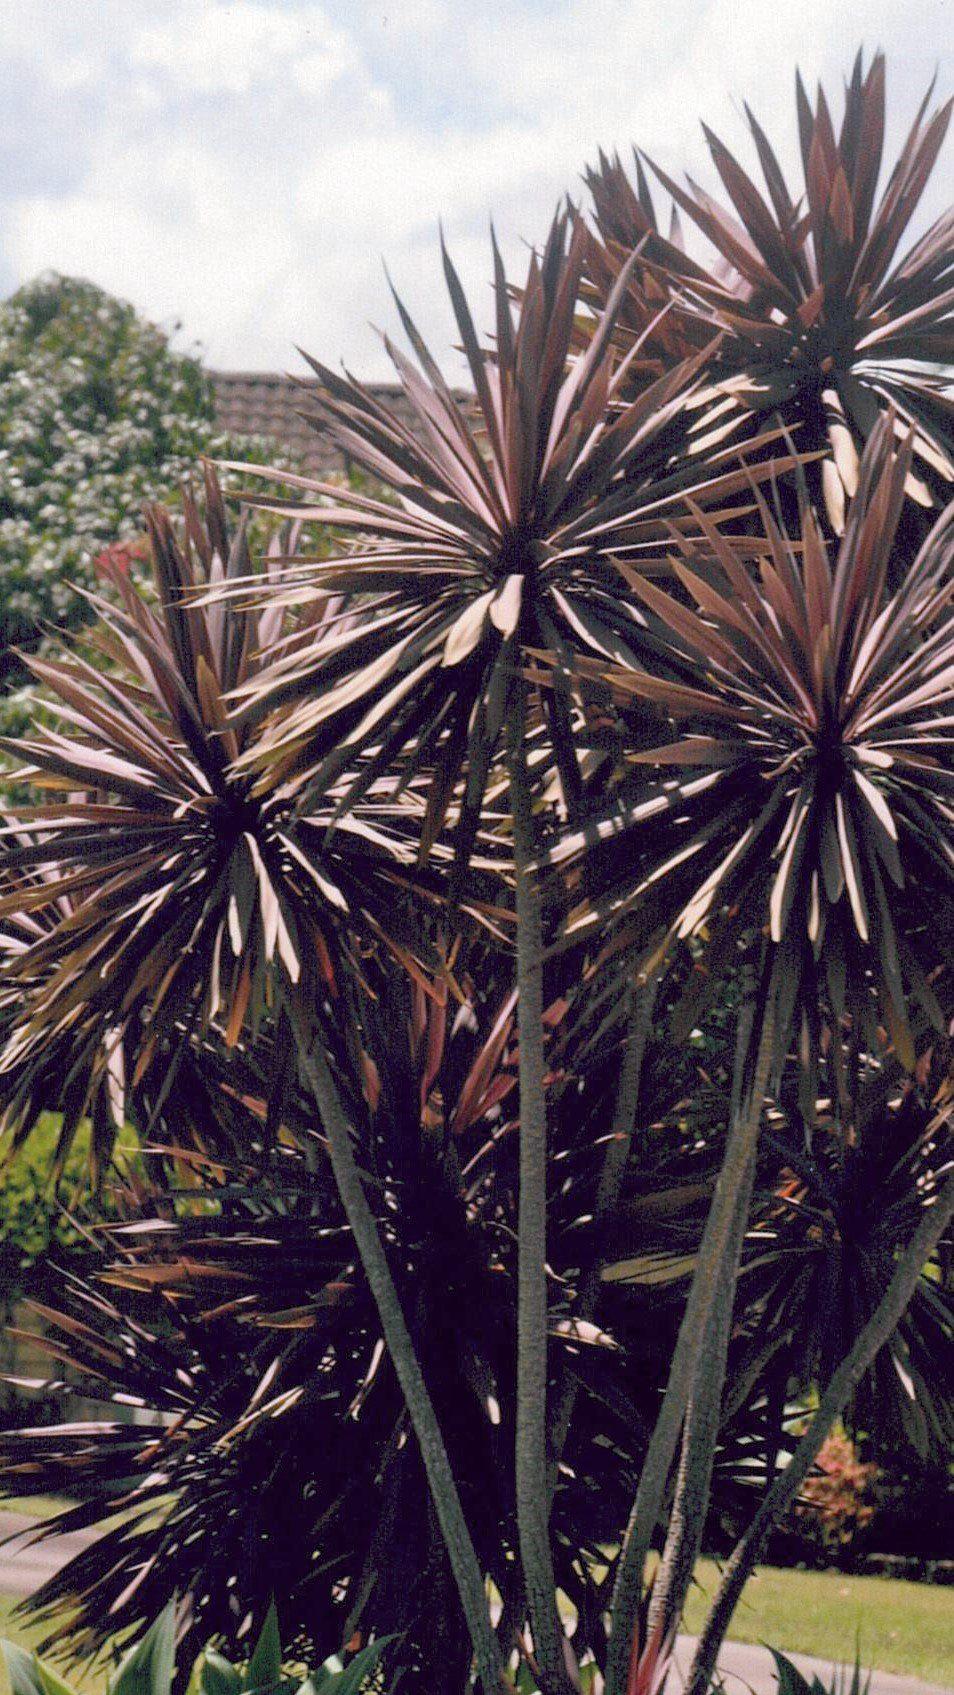 Cordyline australis cv purpurea - ABCeeds